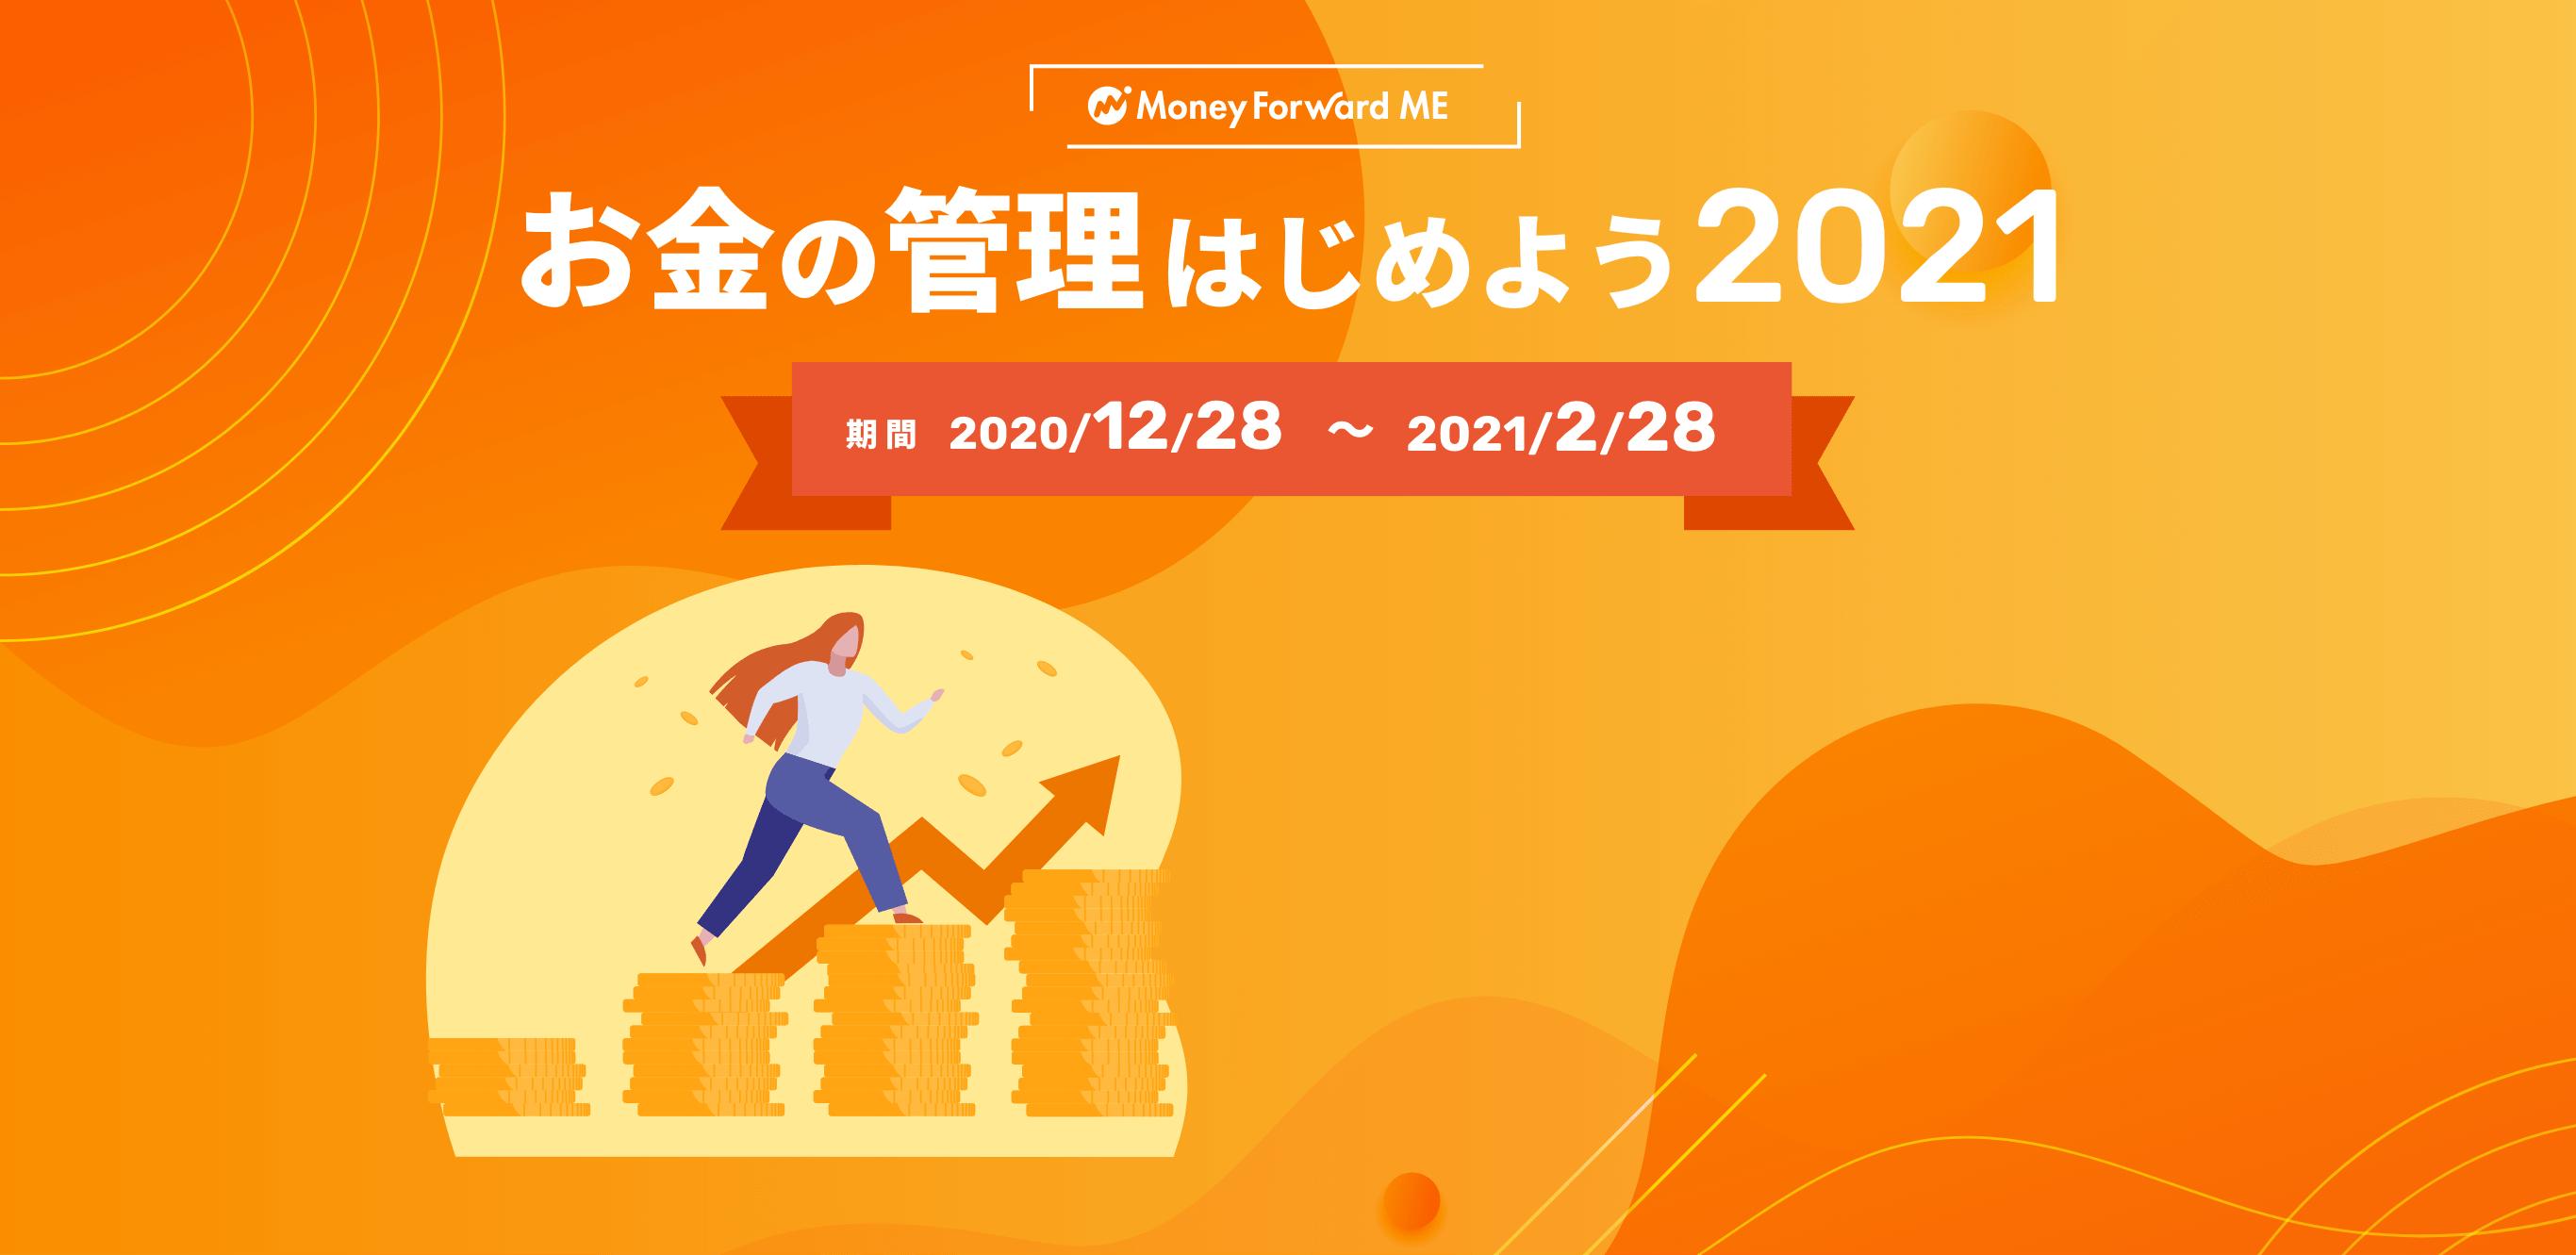 Money Forward ME お金の管理をはじめよう2021 期間 2020/12/28〜2021/2/28